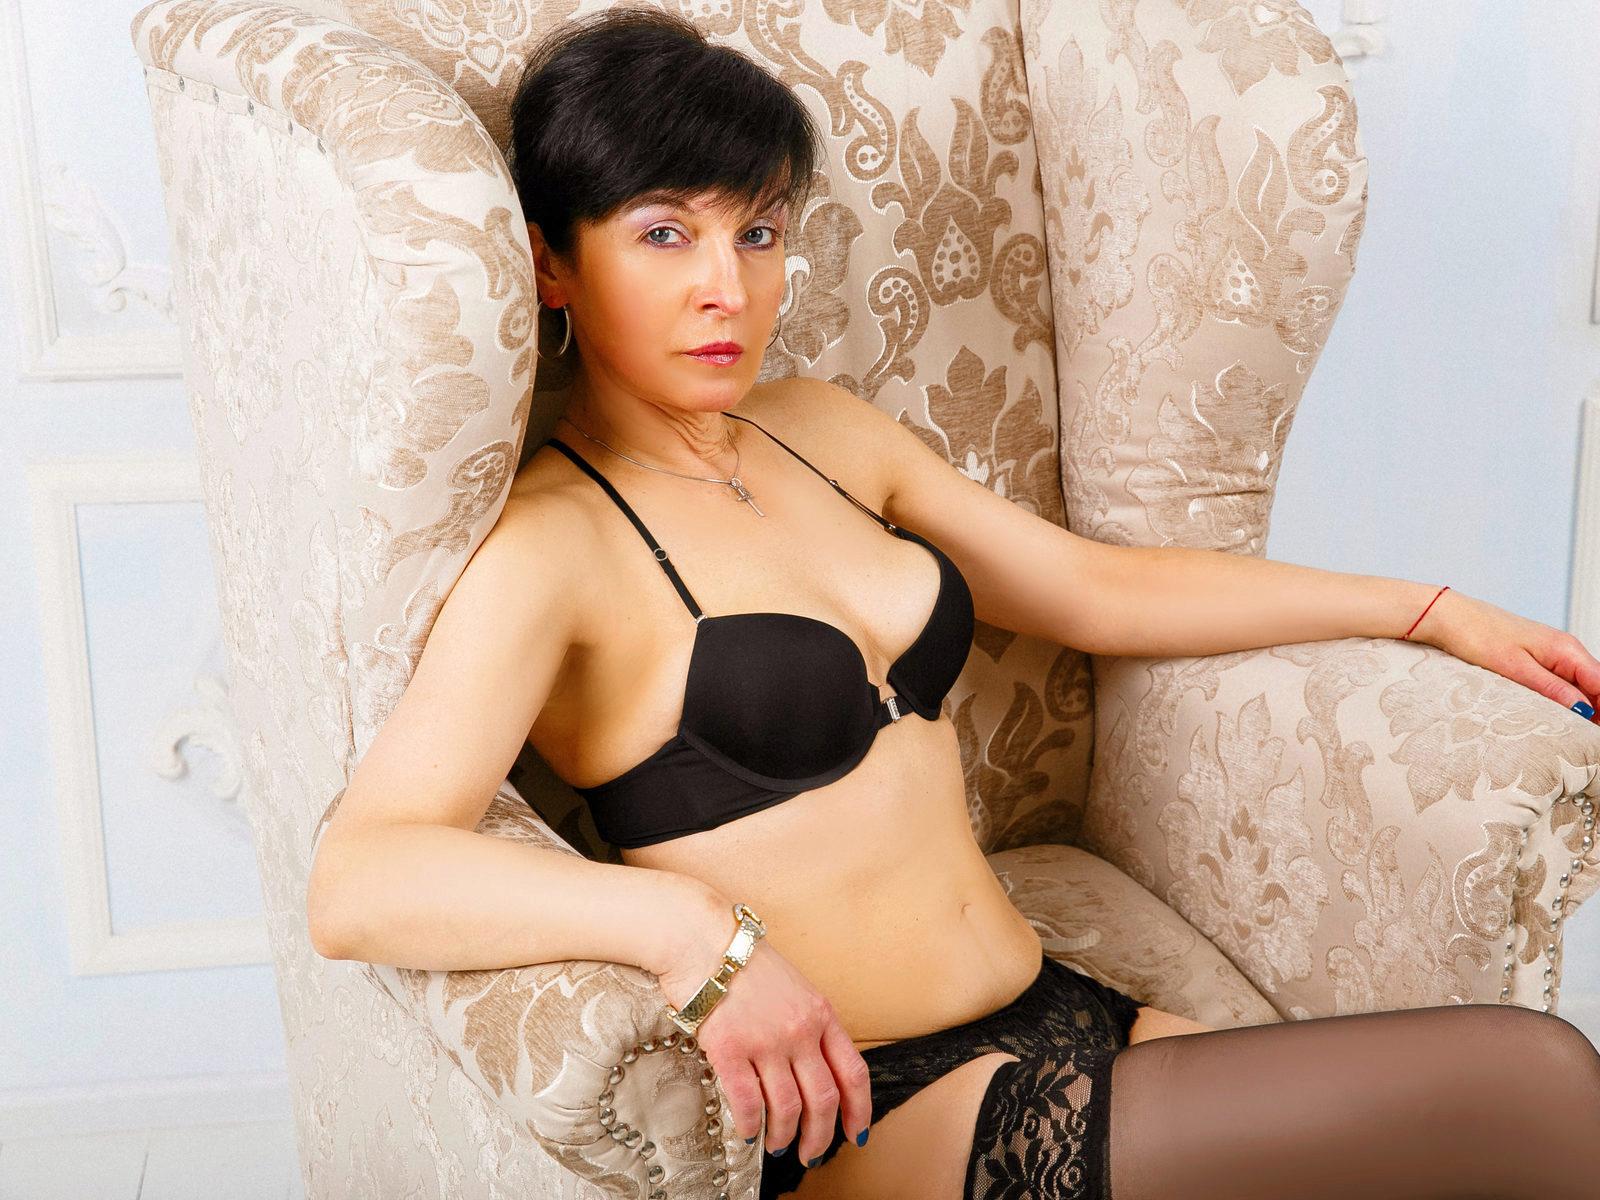 Webcam model Nelly Helen from WebPowerCam